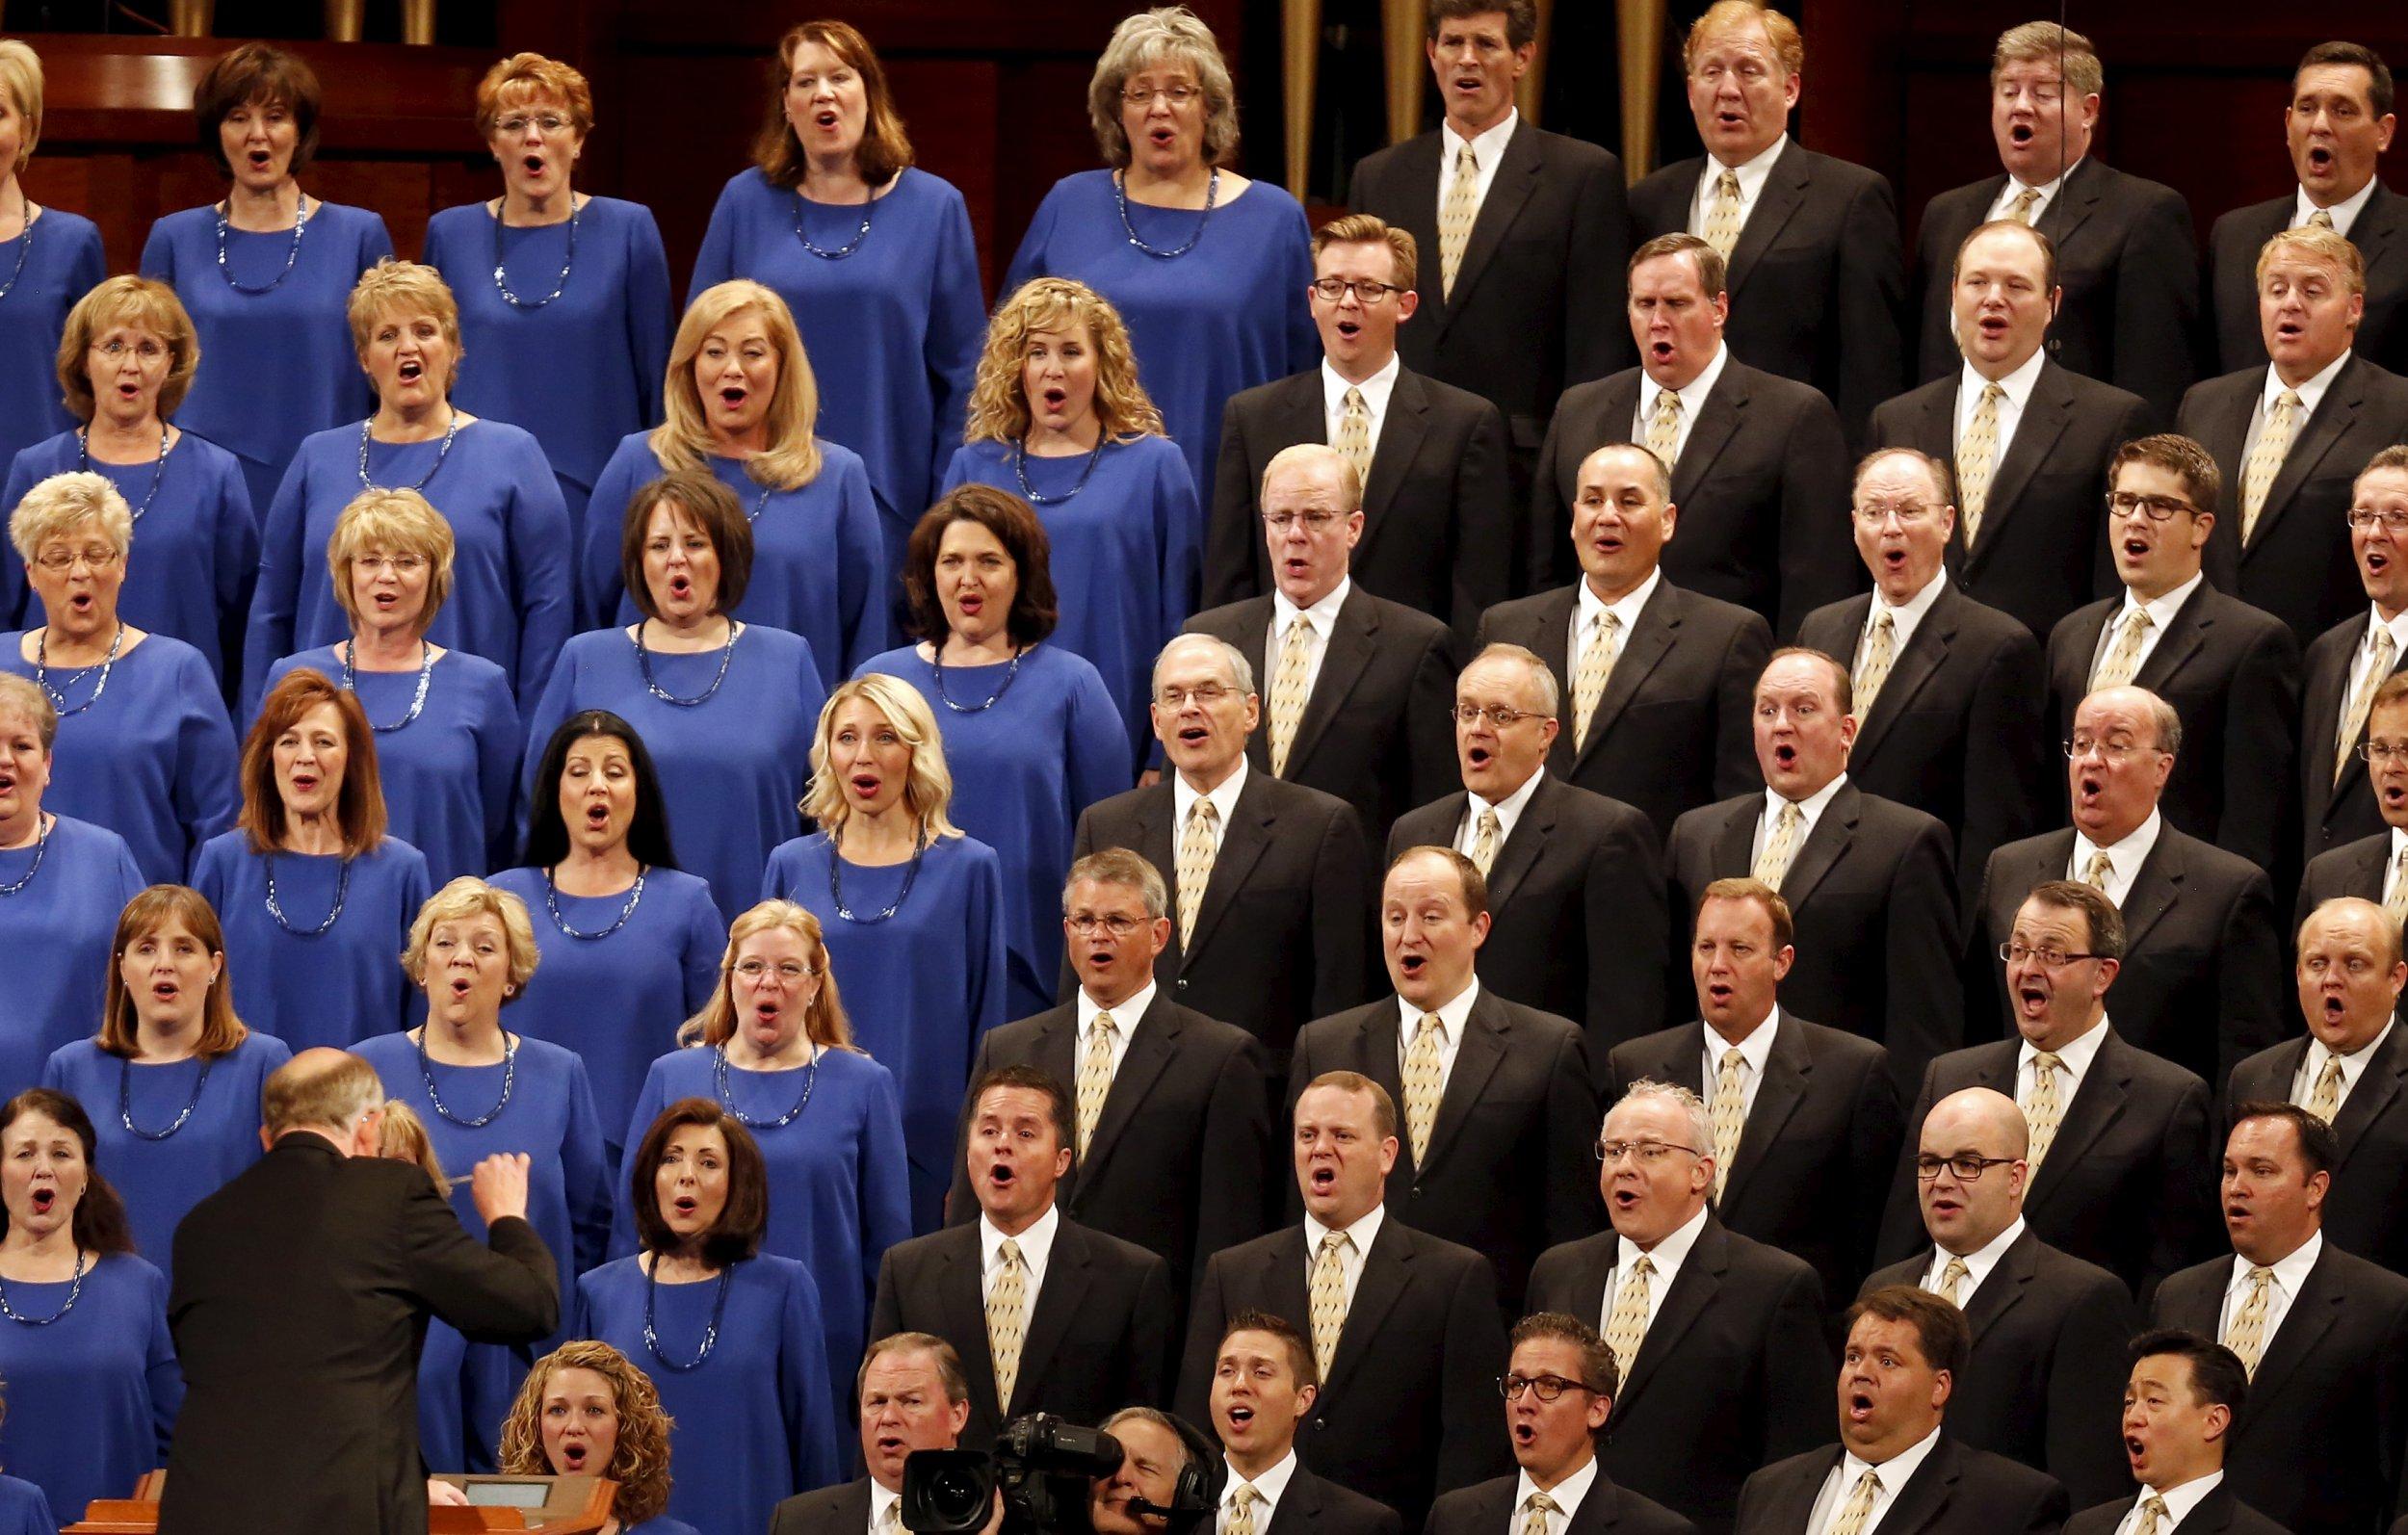 12-22-16 Mormon Tabernacle Choir